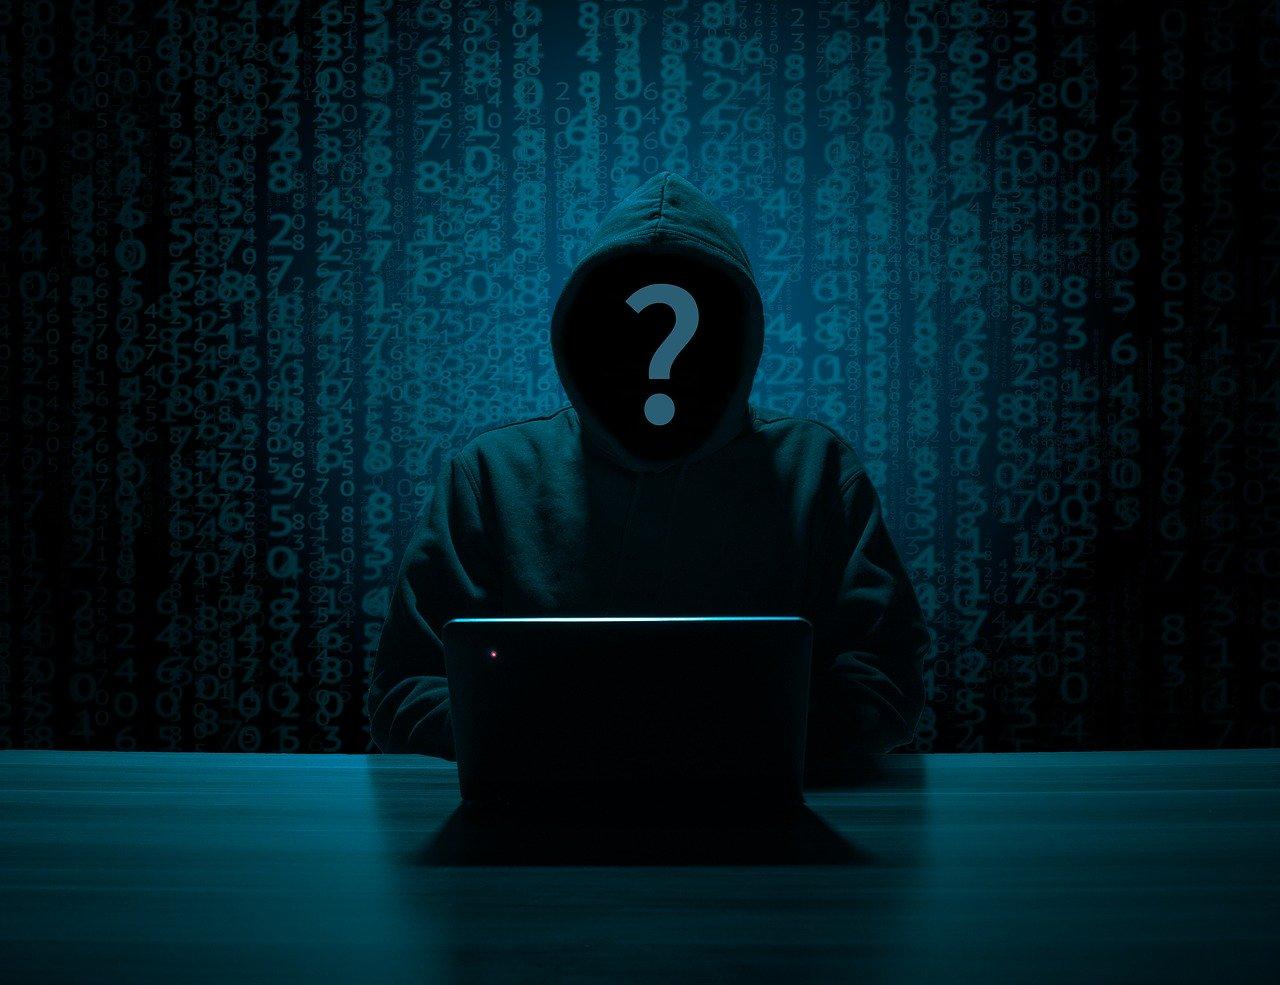 BT Technical Department Scam Calls